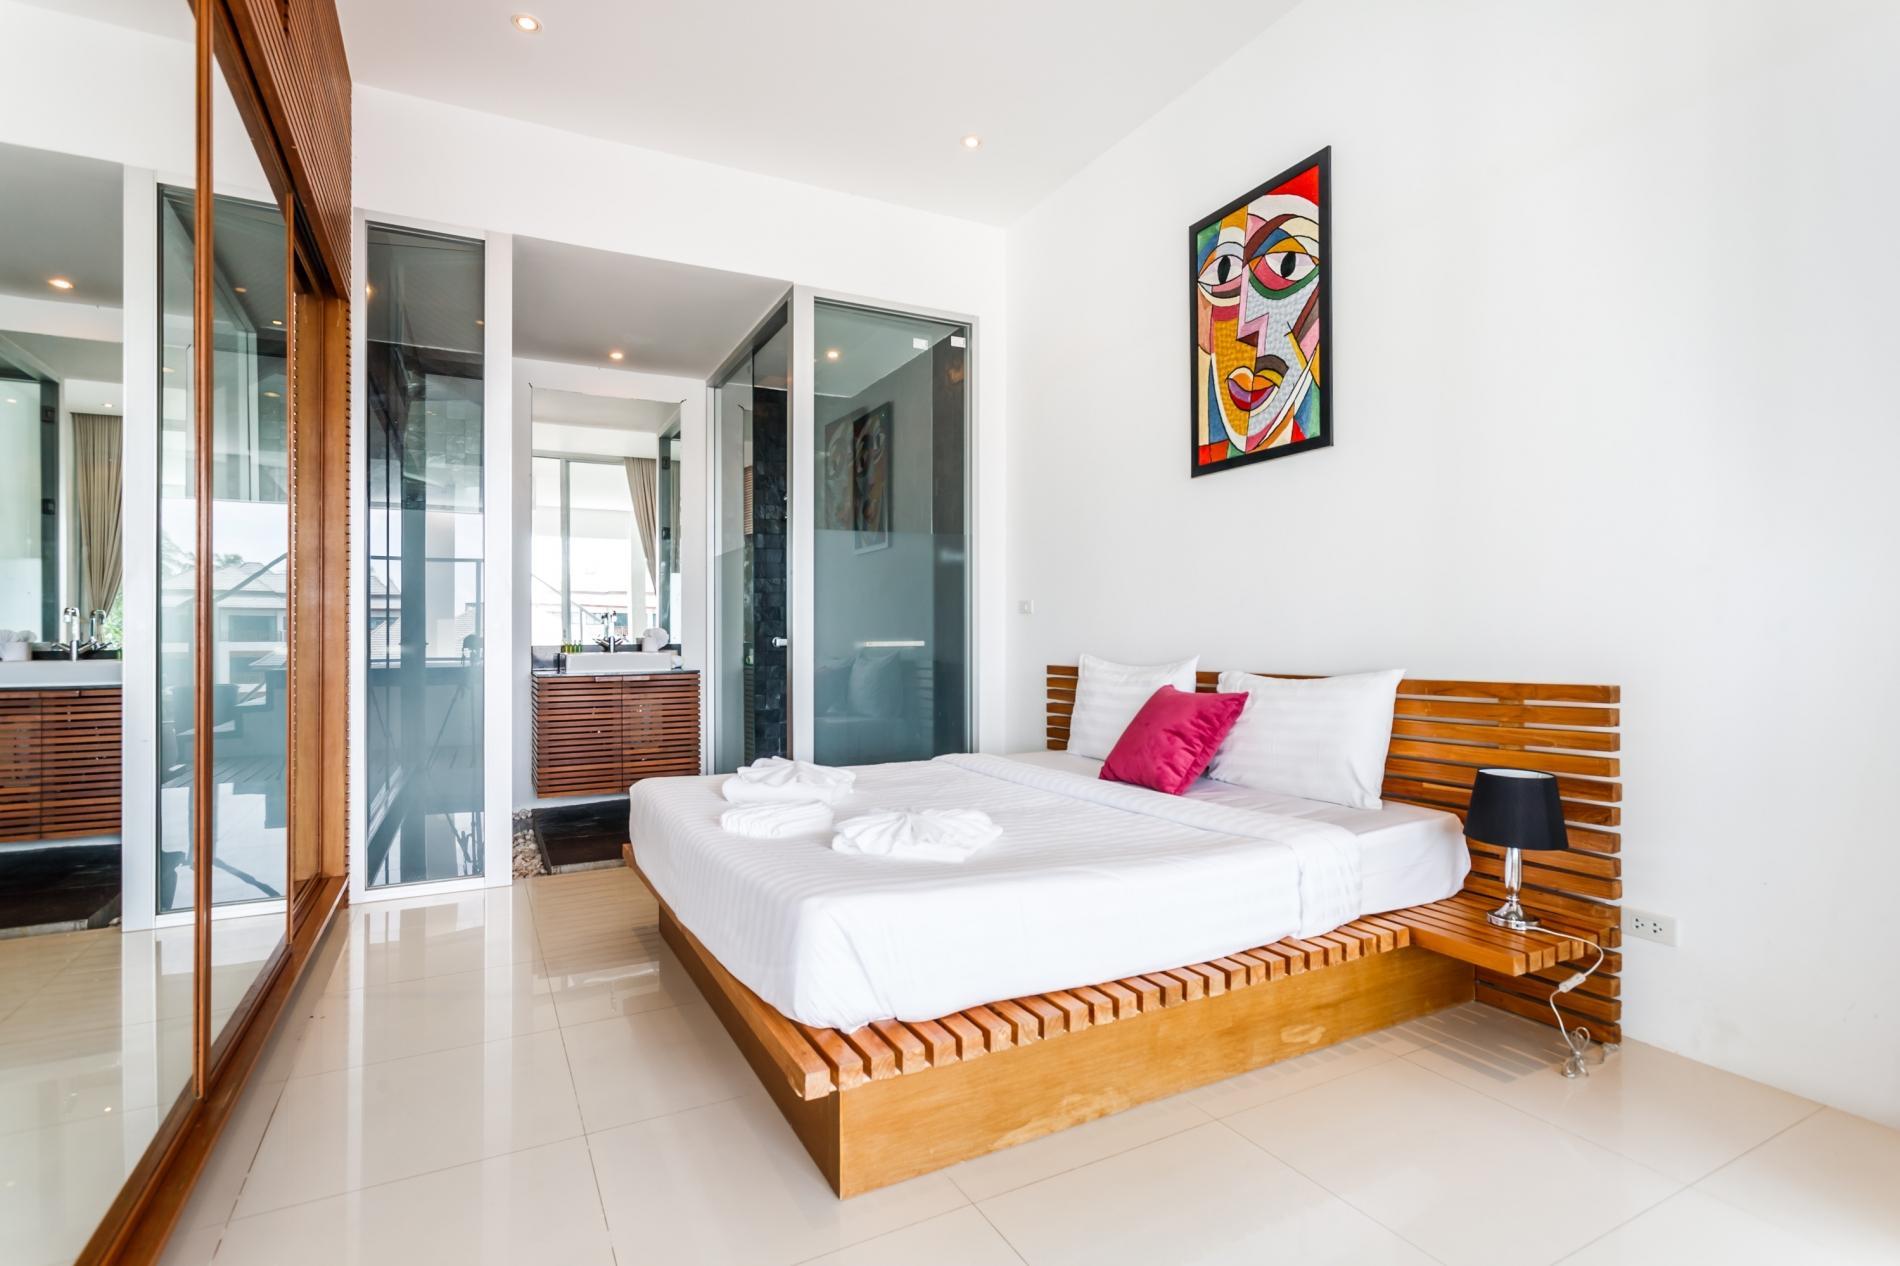 Apartment The Quarter 301 - Luxury Surin 3 bedroom apartment private pool photo 20255004